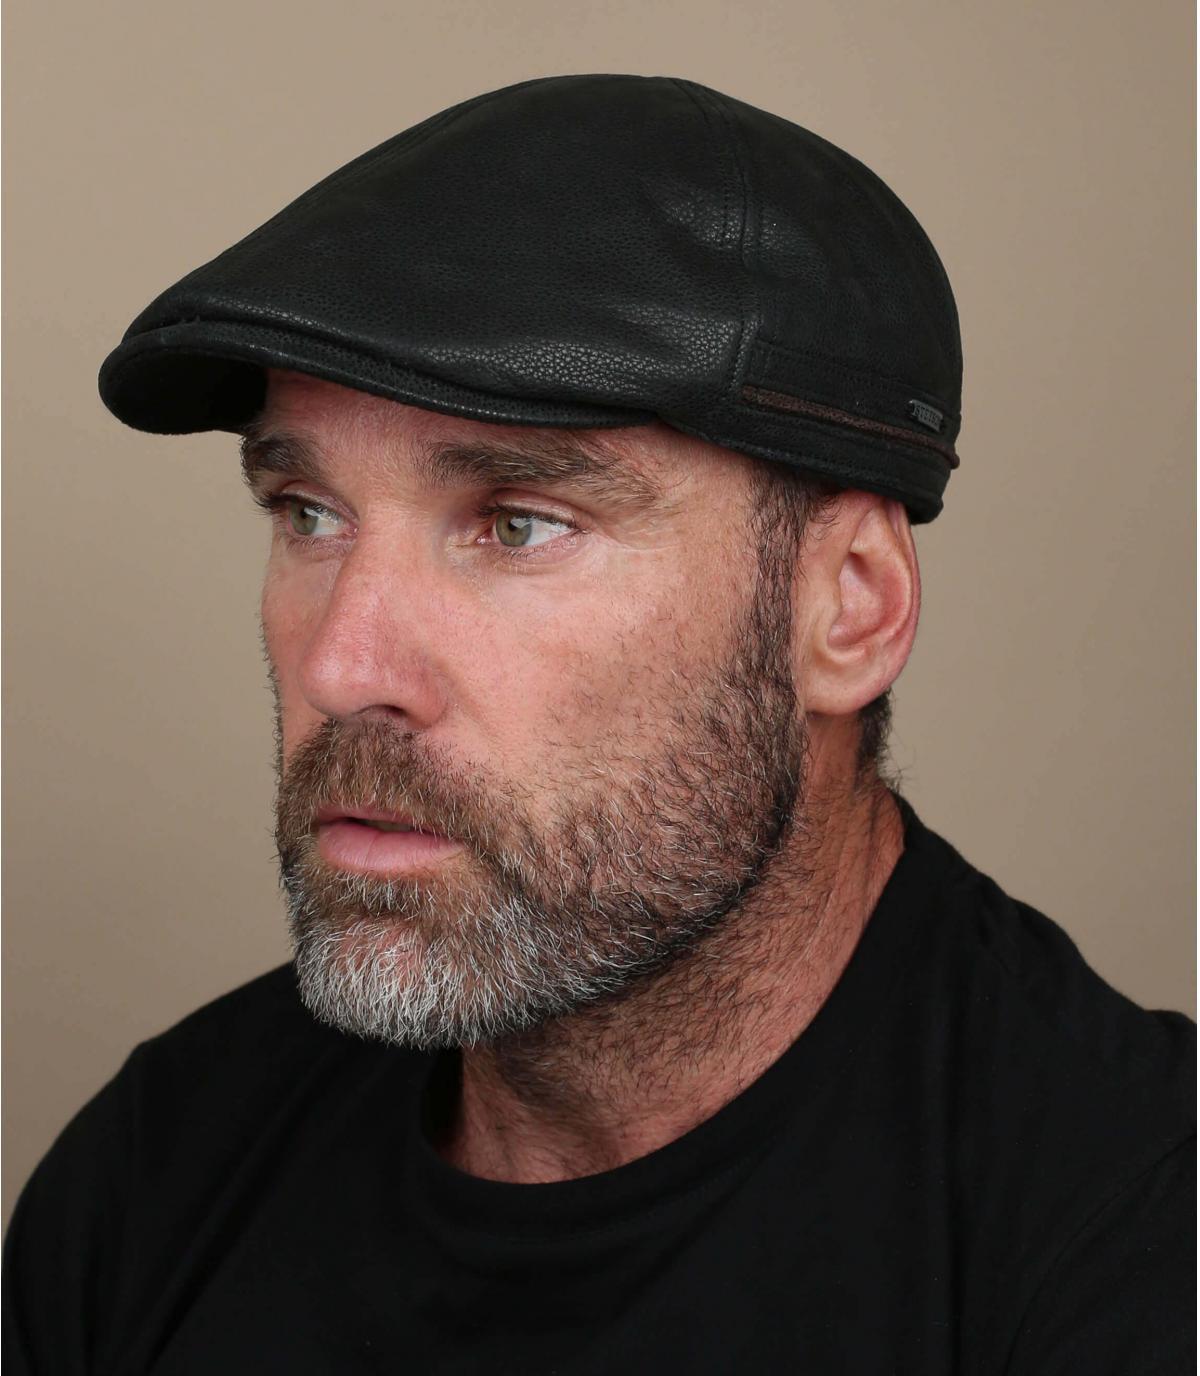 Stetson black flat cap